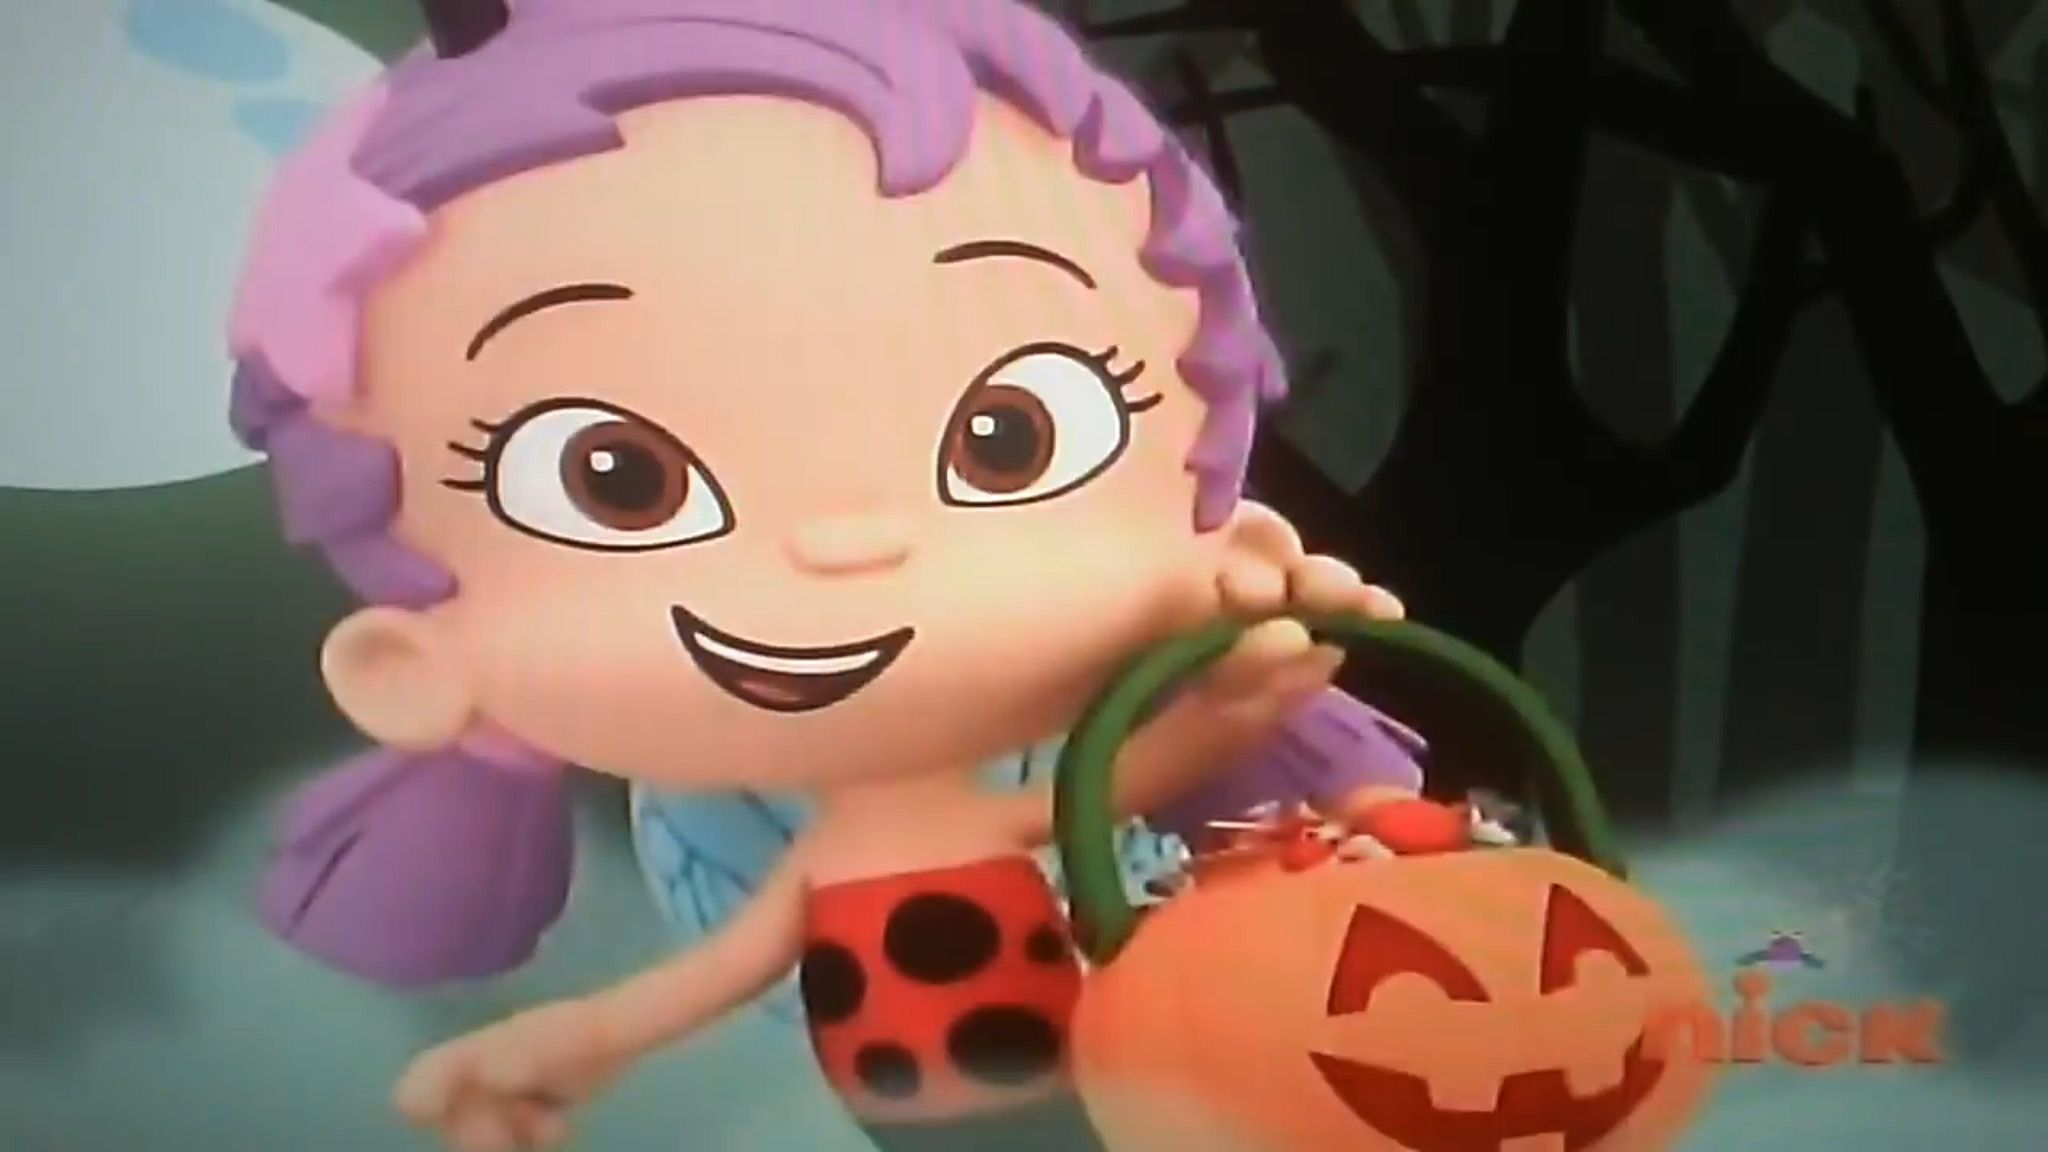 BUBBLE GUPPIES - Nonny, Deema, & Oona For Halloween Party ...  |Bubble Guppies Nonny Happy